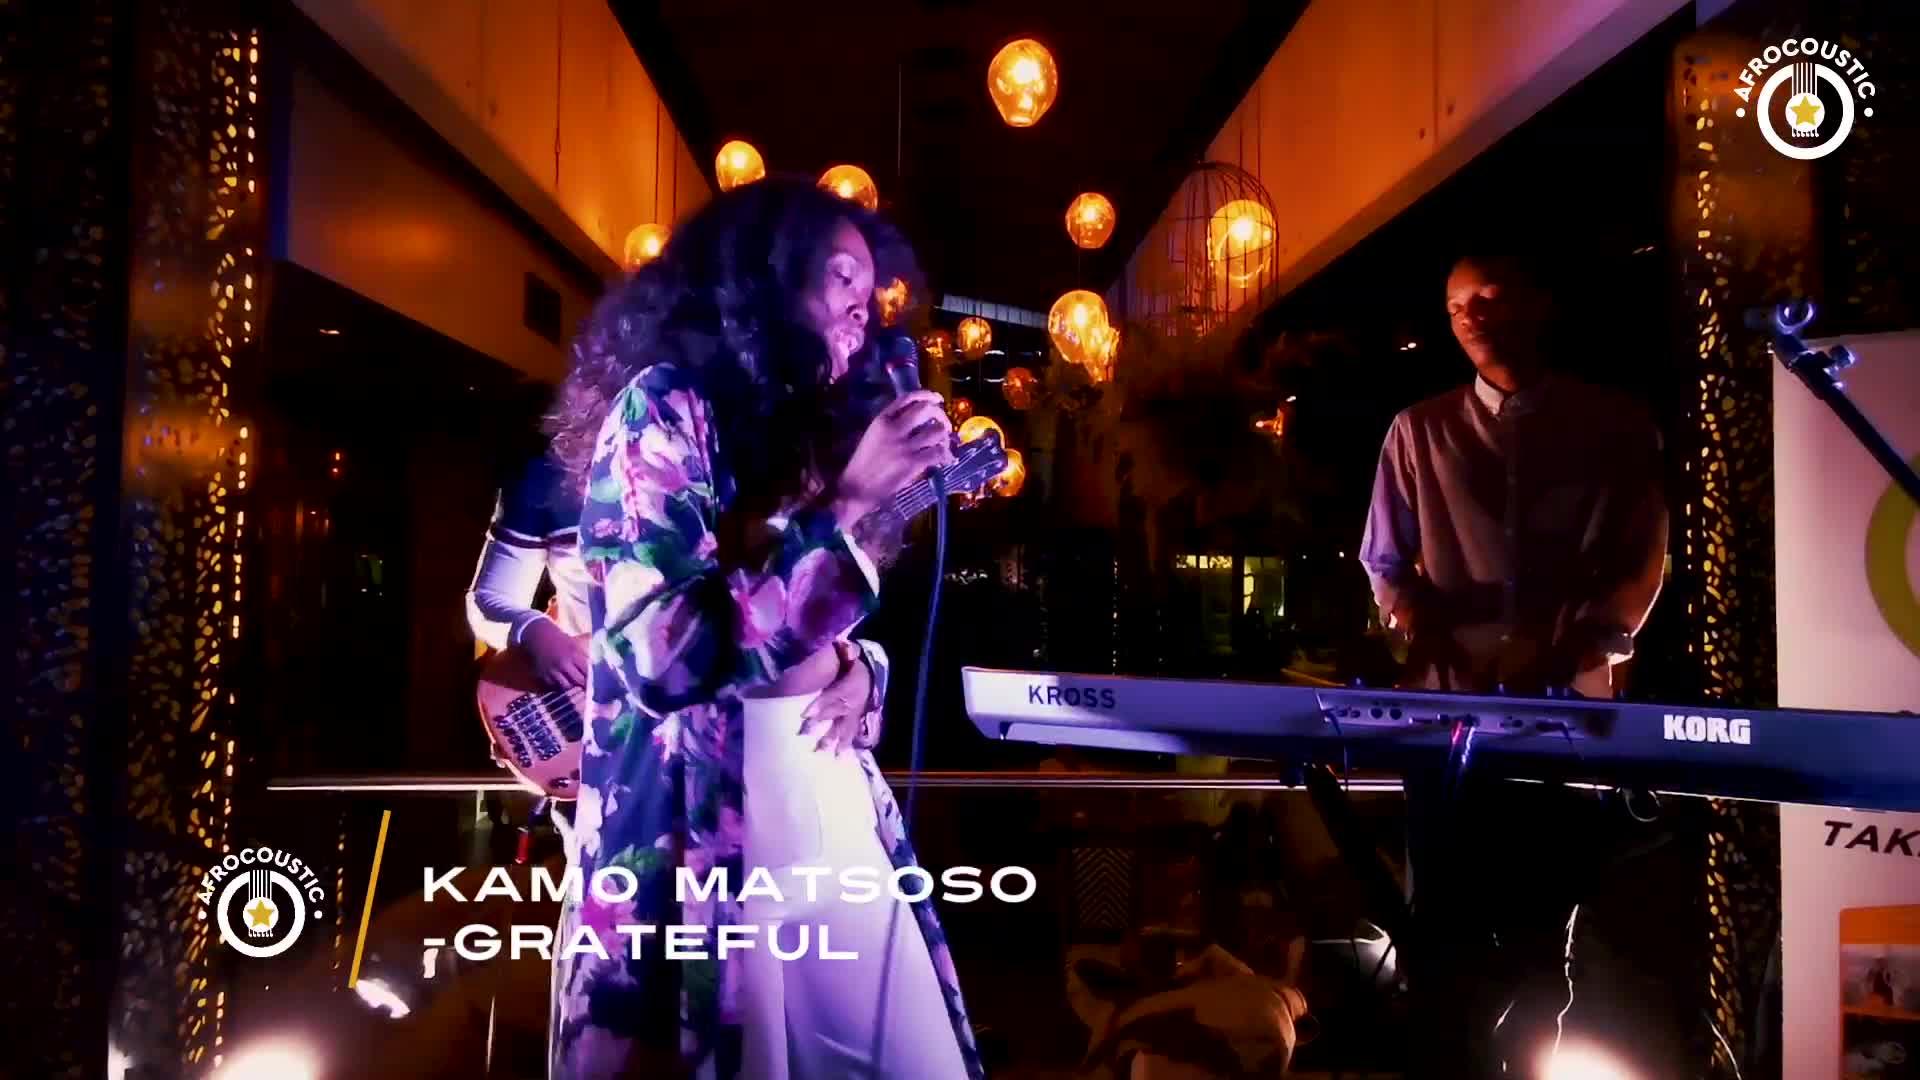 Afrocoustic - Kamo Matsoso - Grateful